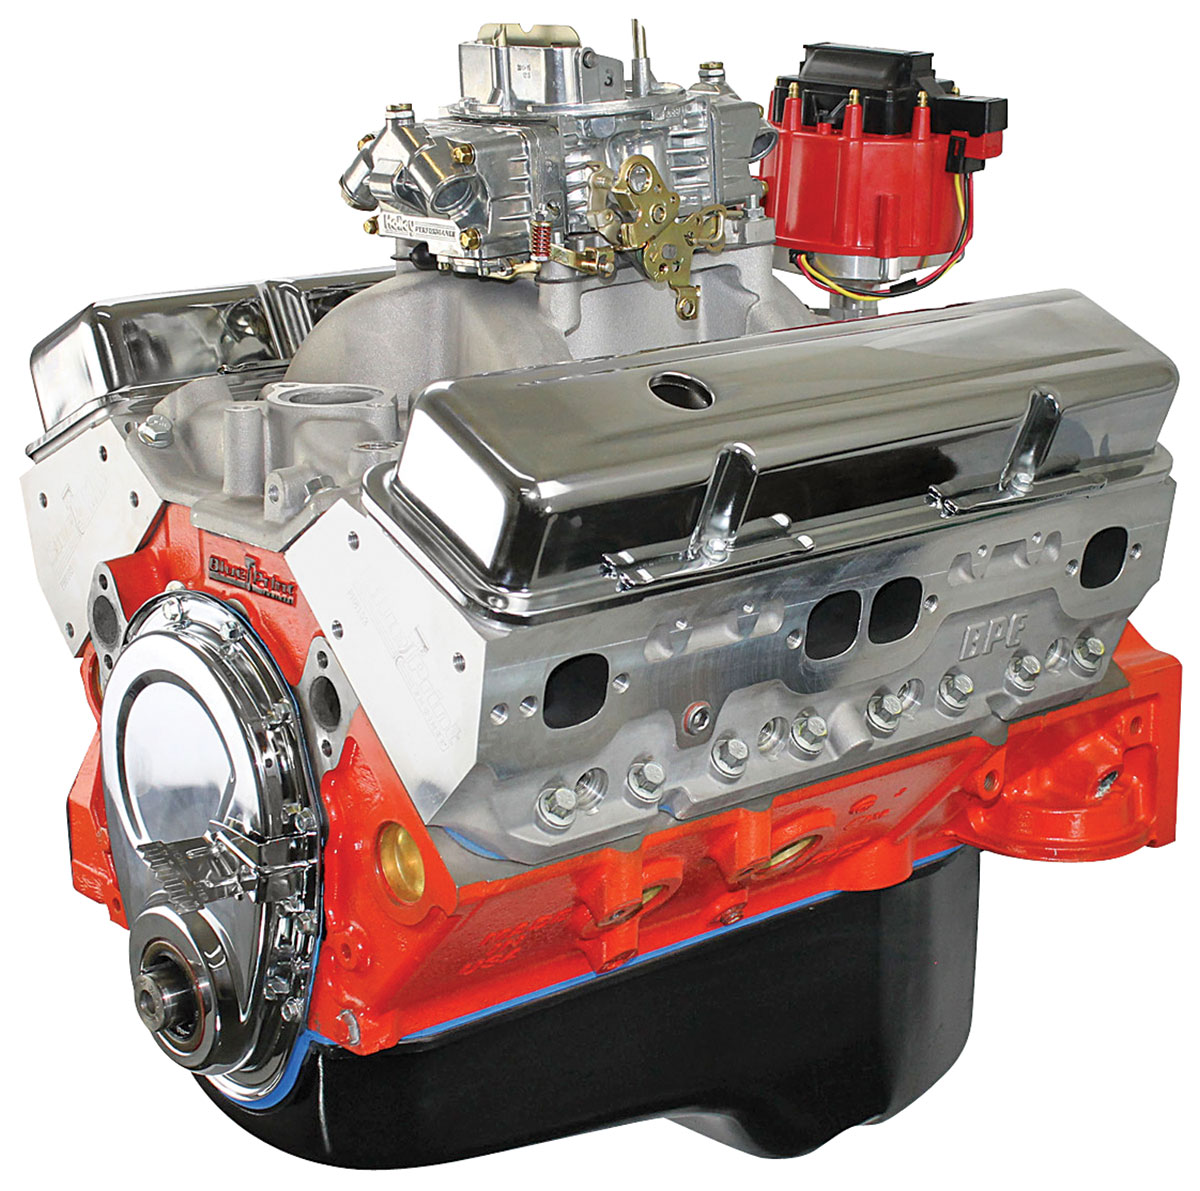 Crate Engine, BluePrint, 400, Base Dressed